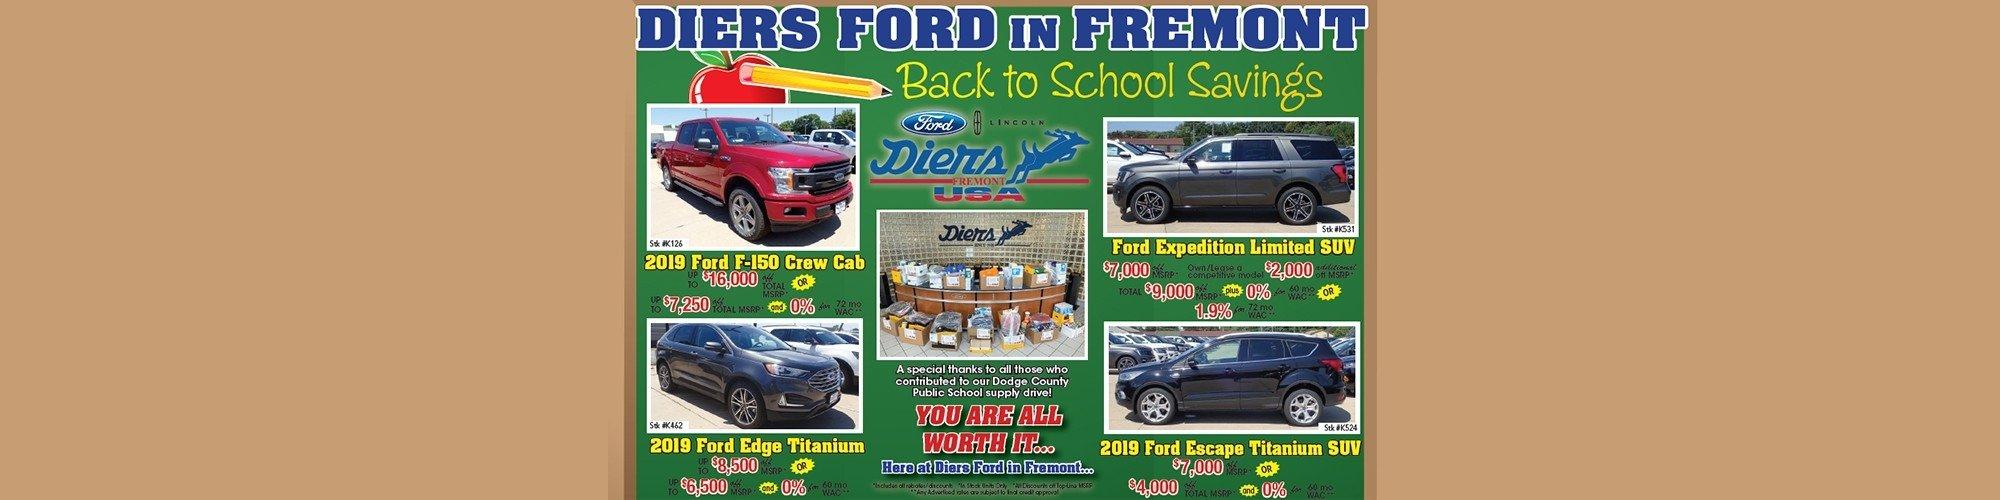 Omaha Ford Dealers >> Fremont Ford Dealer Diers Ford Used Car Dealership